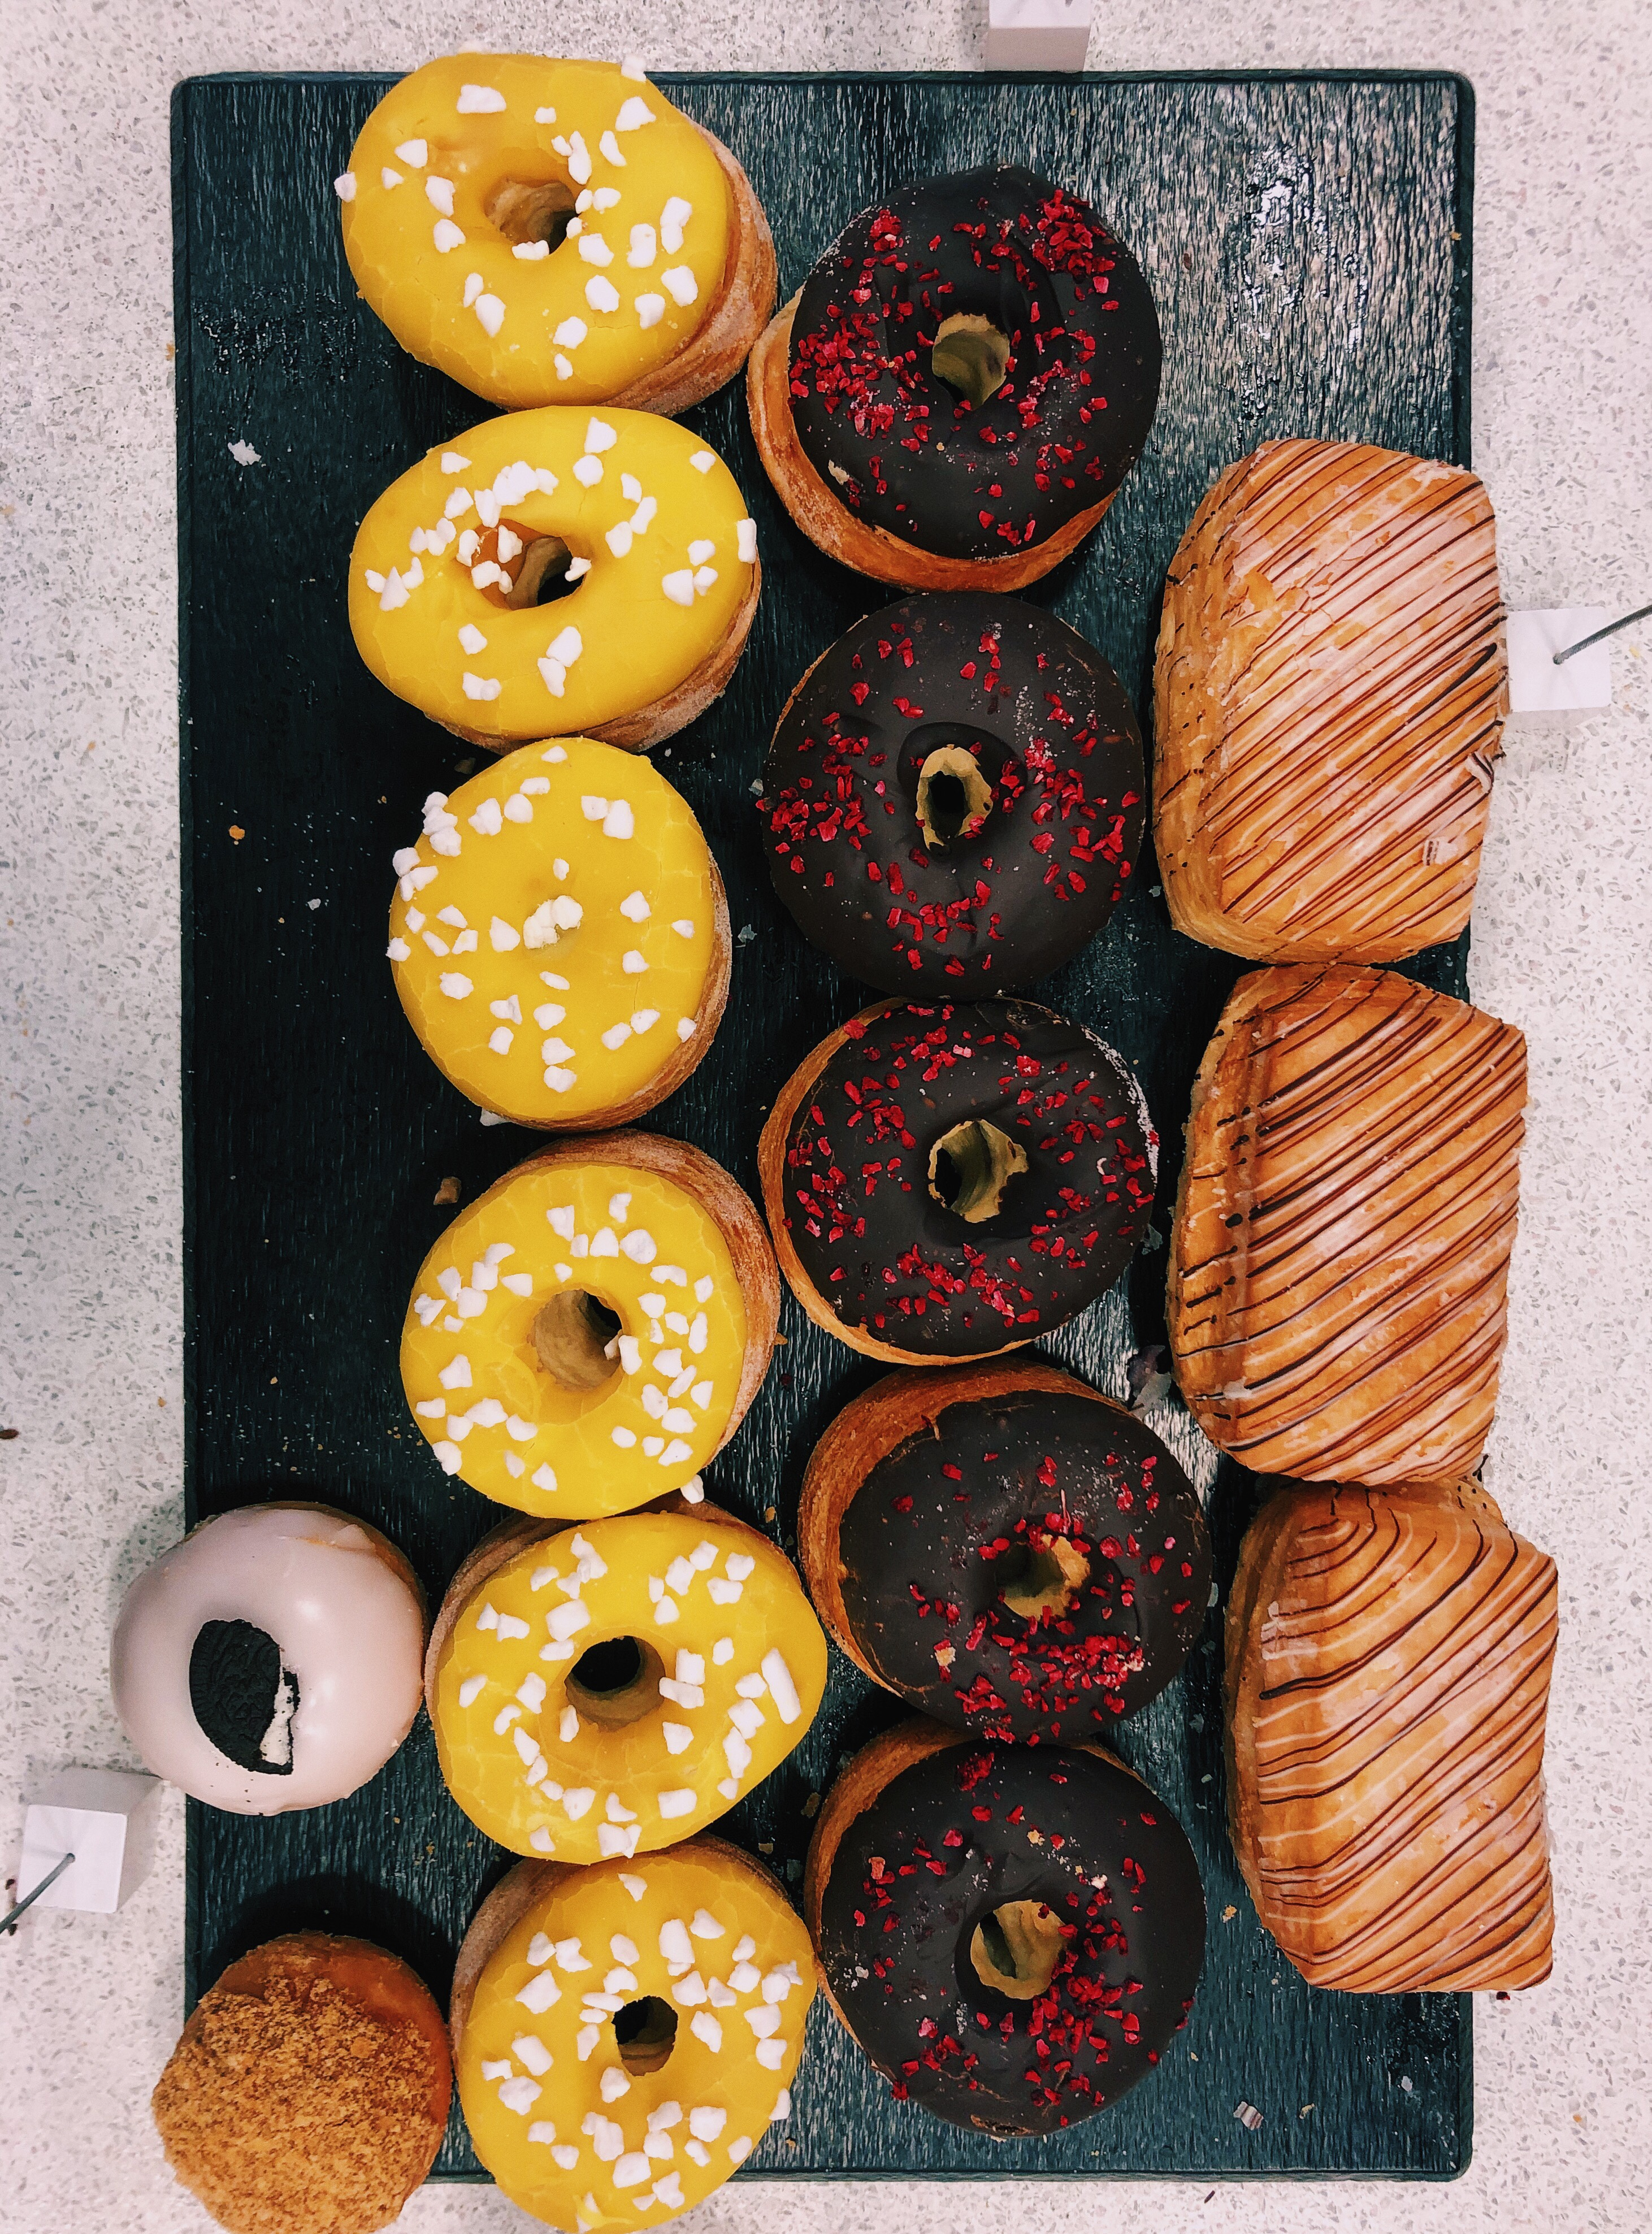 Dum Dum Donutterie doughnuts